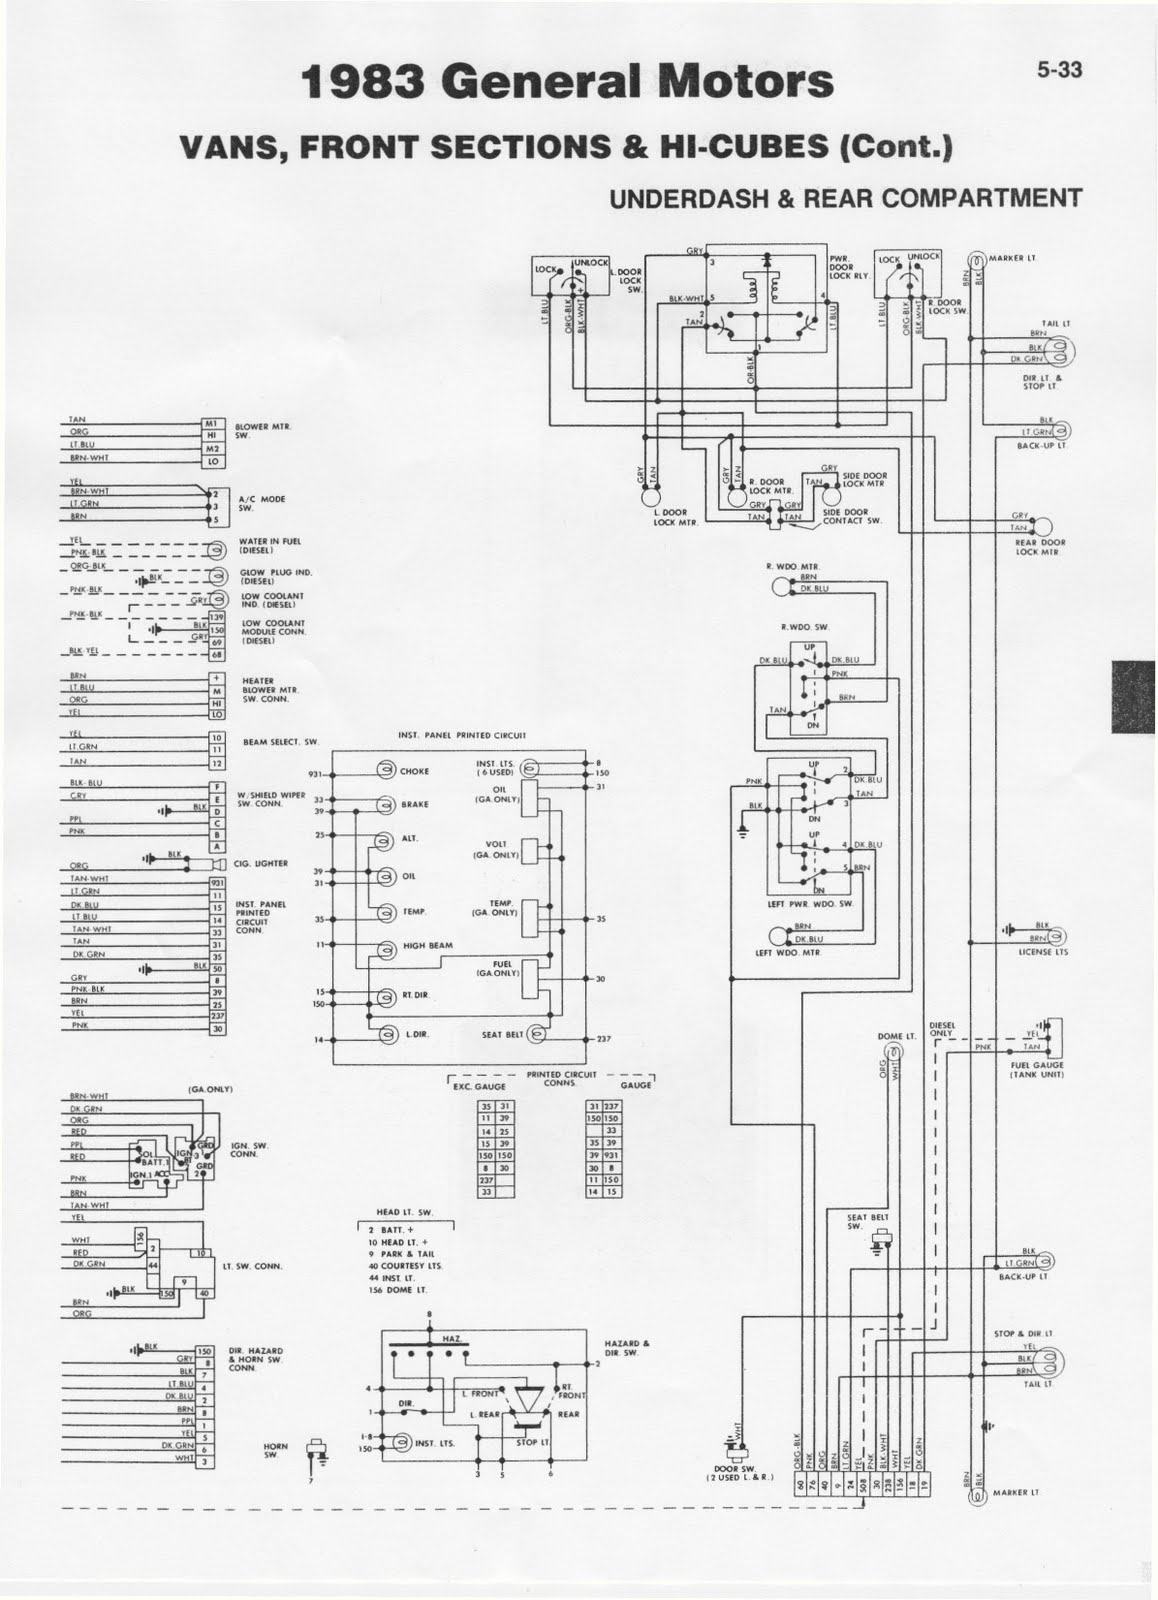 WW_2206] Switch Wiring Diagram On Champion Motor Grader Starter Wiring  Diagram Wiring DiagramUmize Hapolo Mohammedshrine Librar Wiring 101